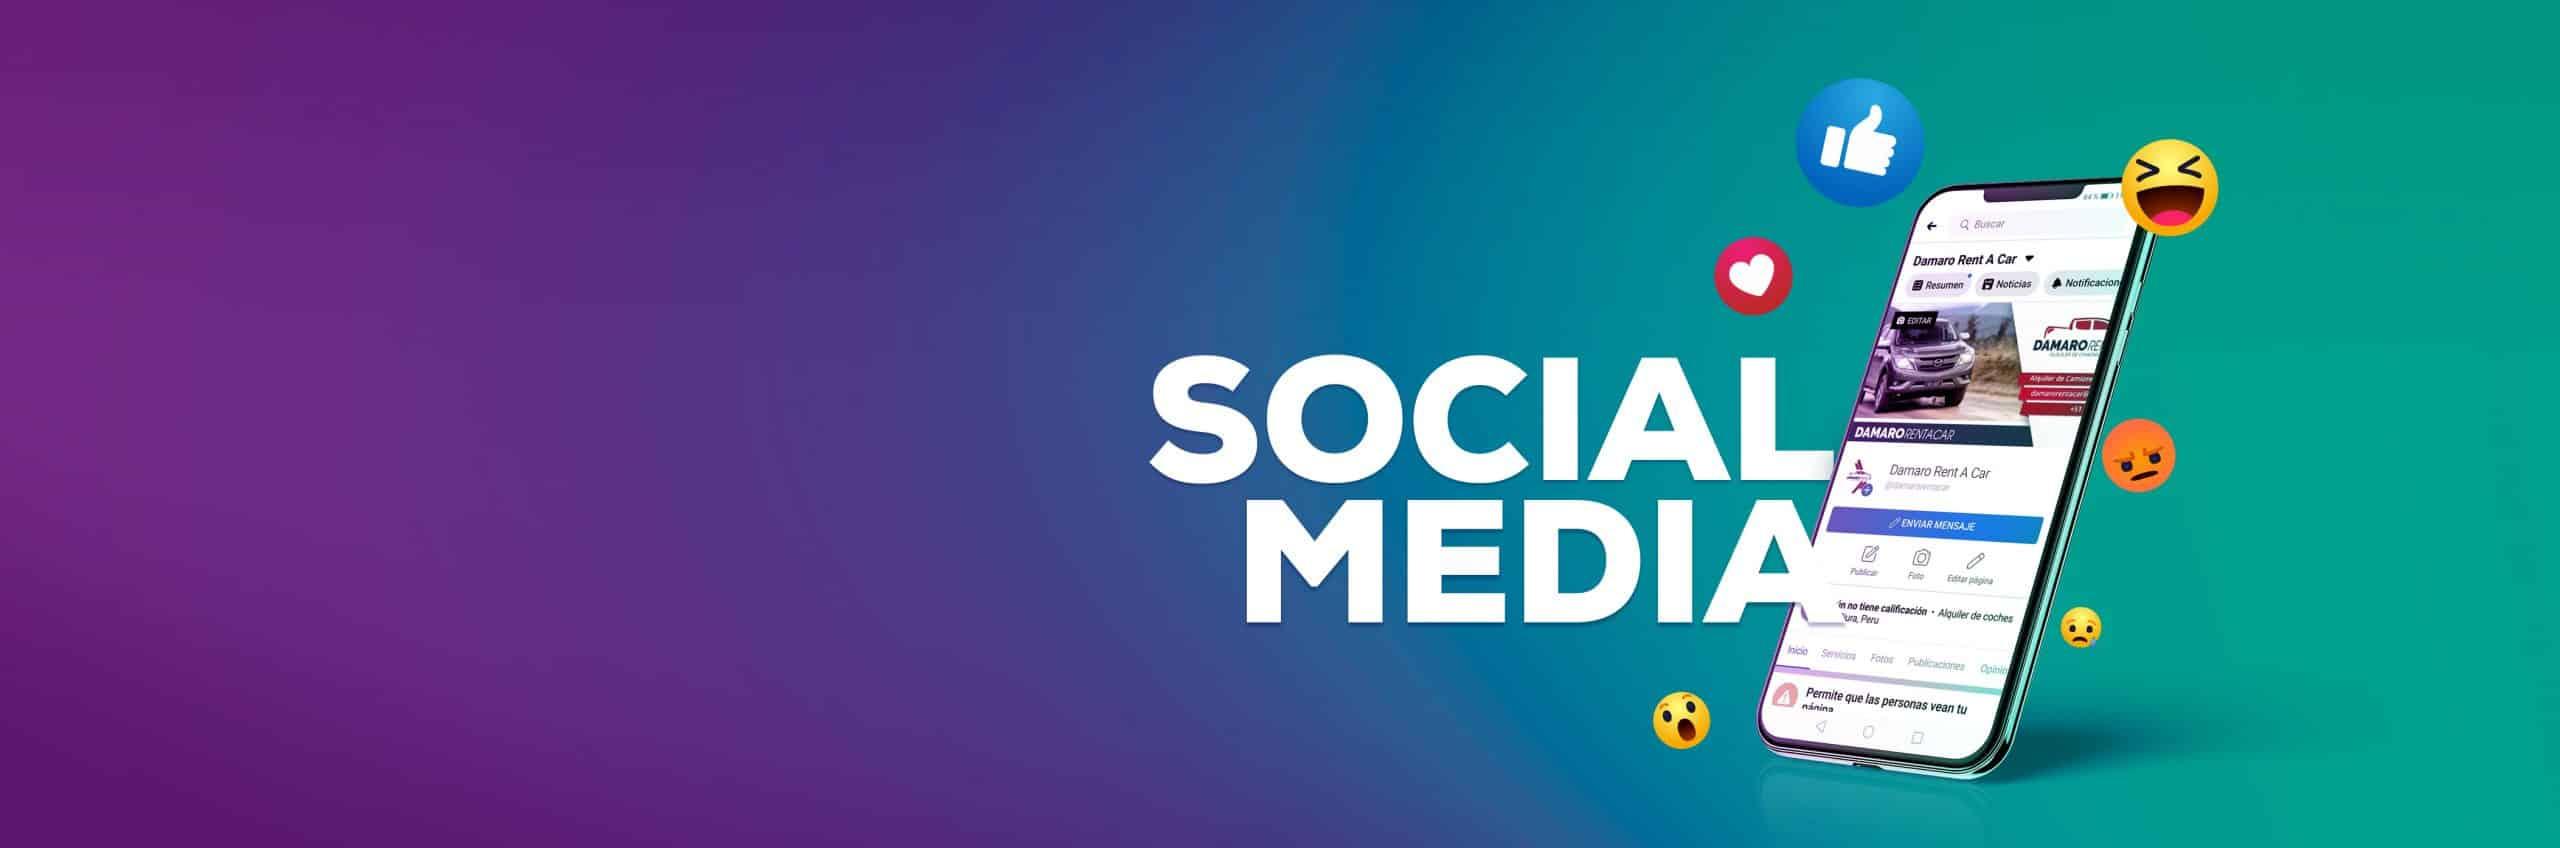 rewel-site-social-media